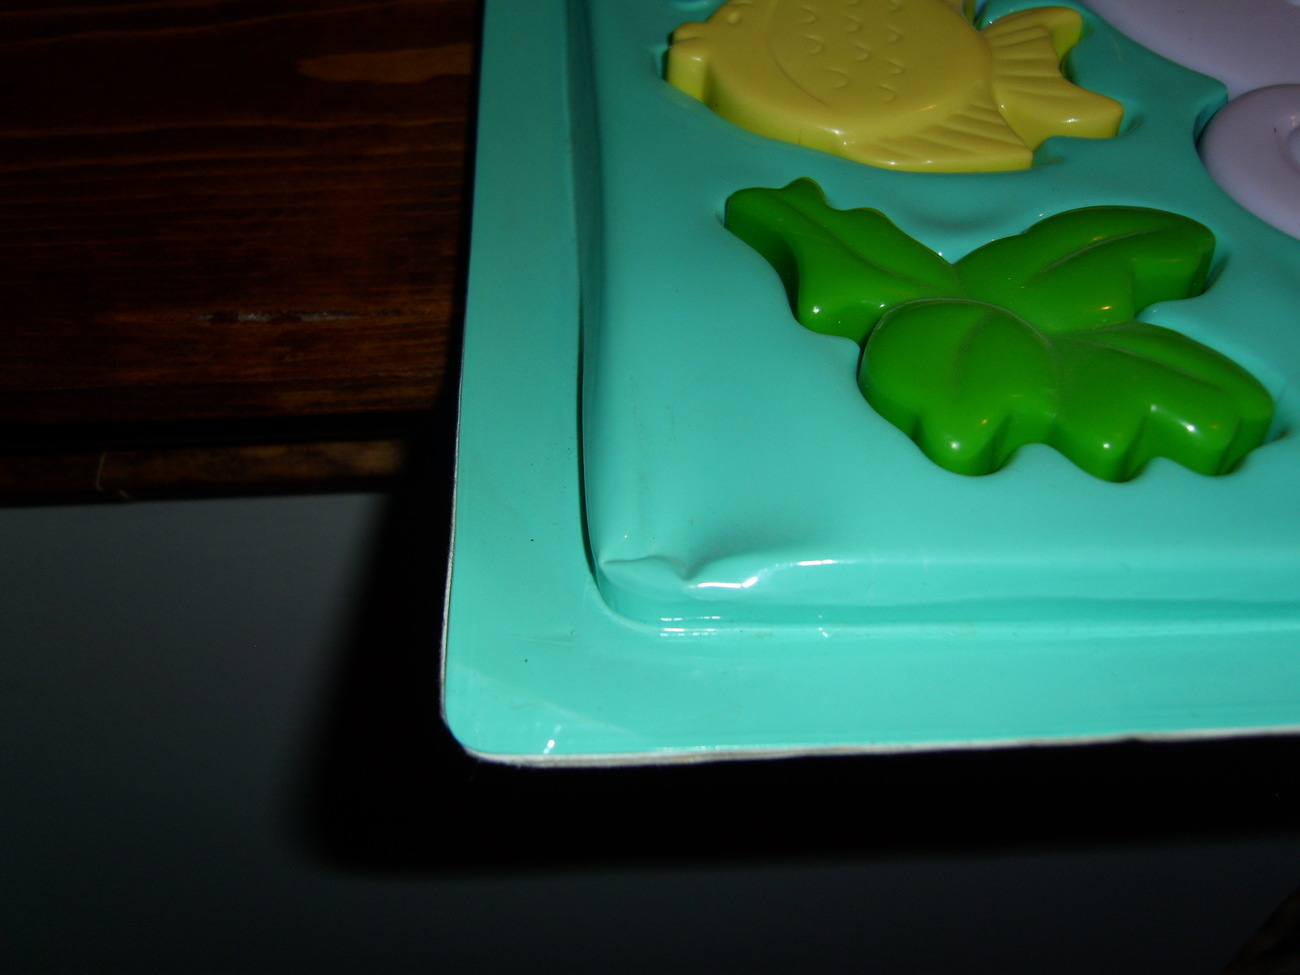 My Little Pony G1 merchandise Sea Light plastic puzzle